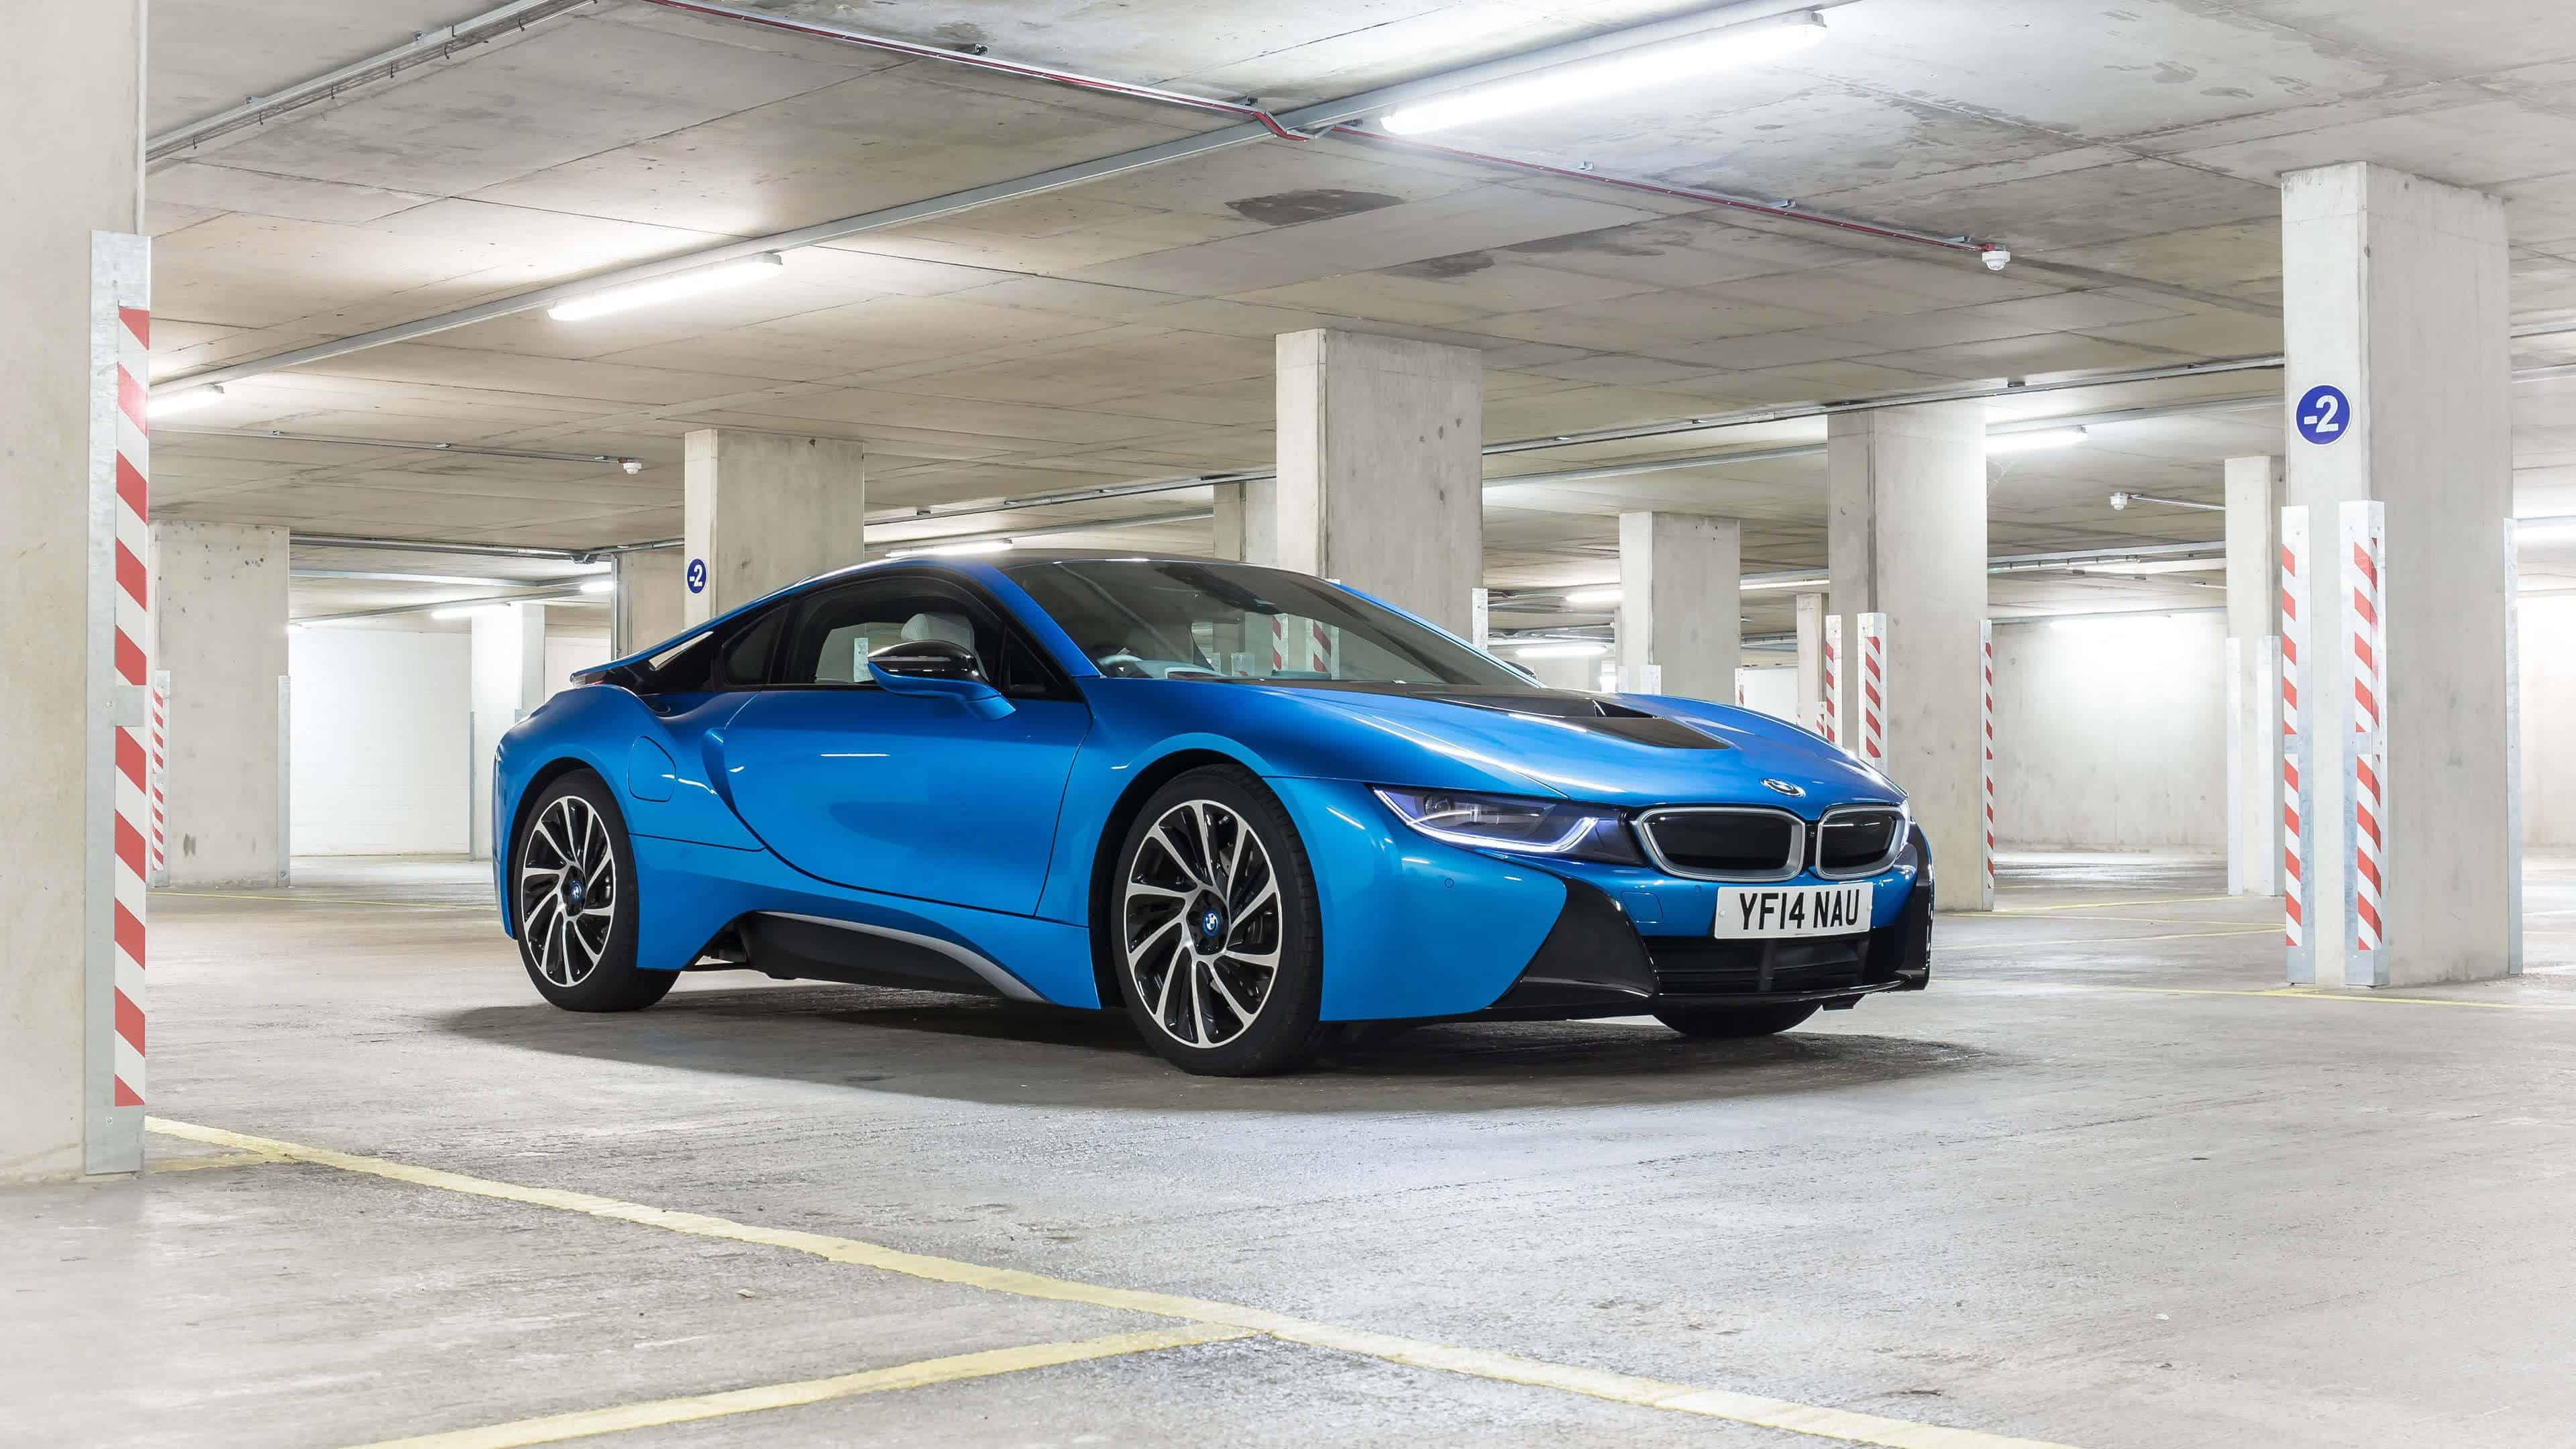 2016 Blue BMW I8 UHD 4K Wallpaper Pixelz